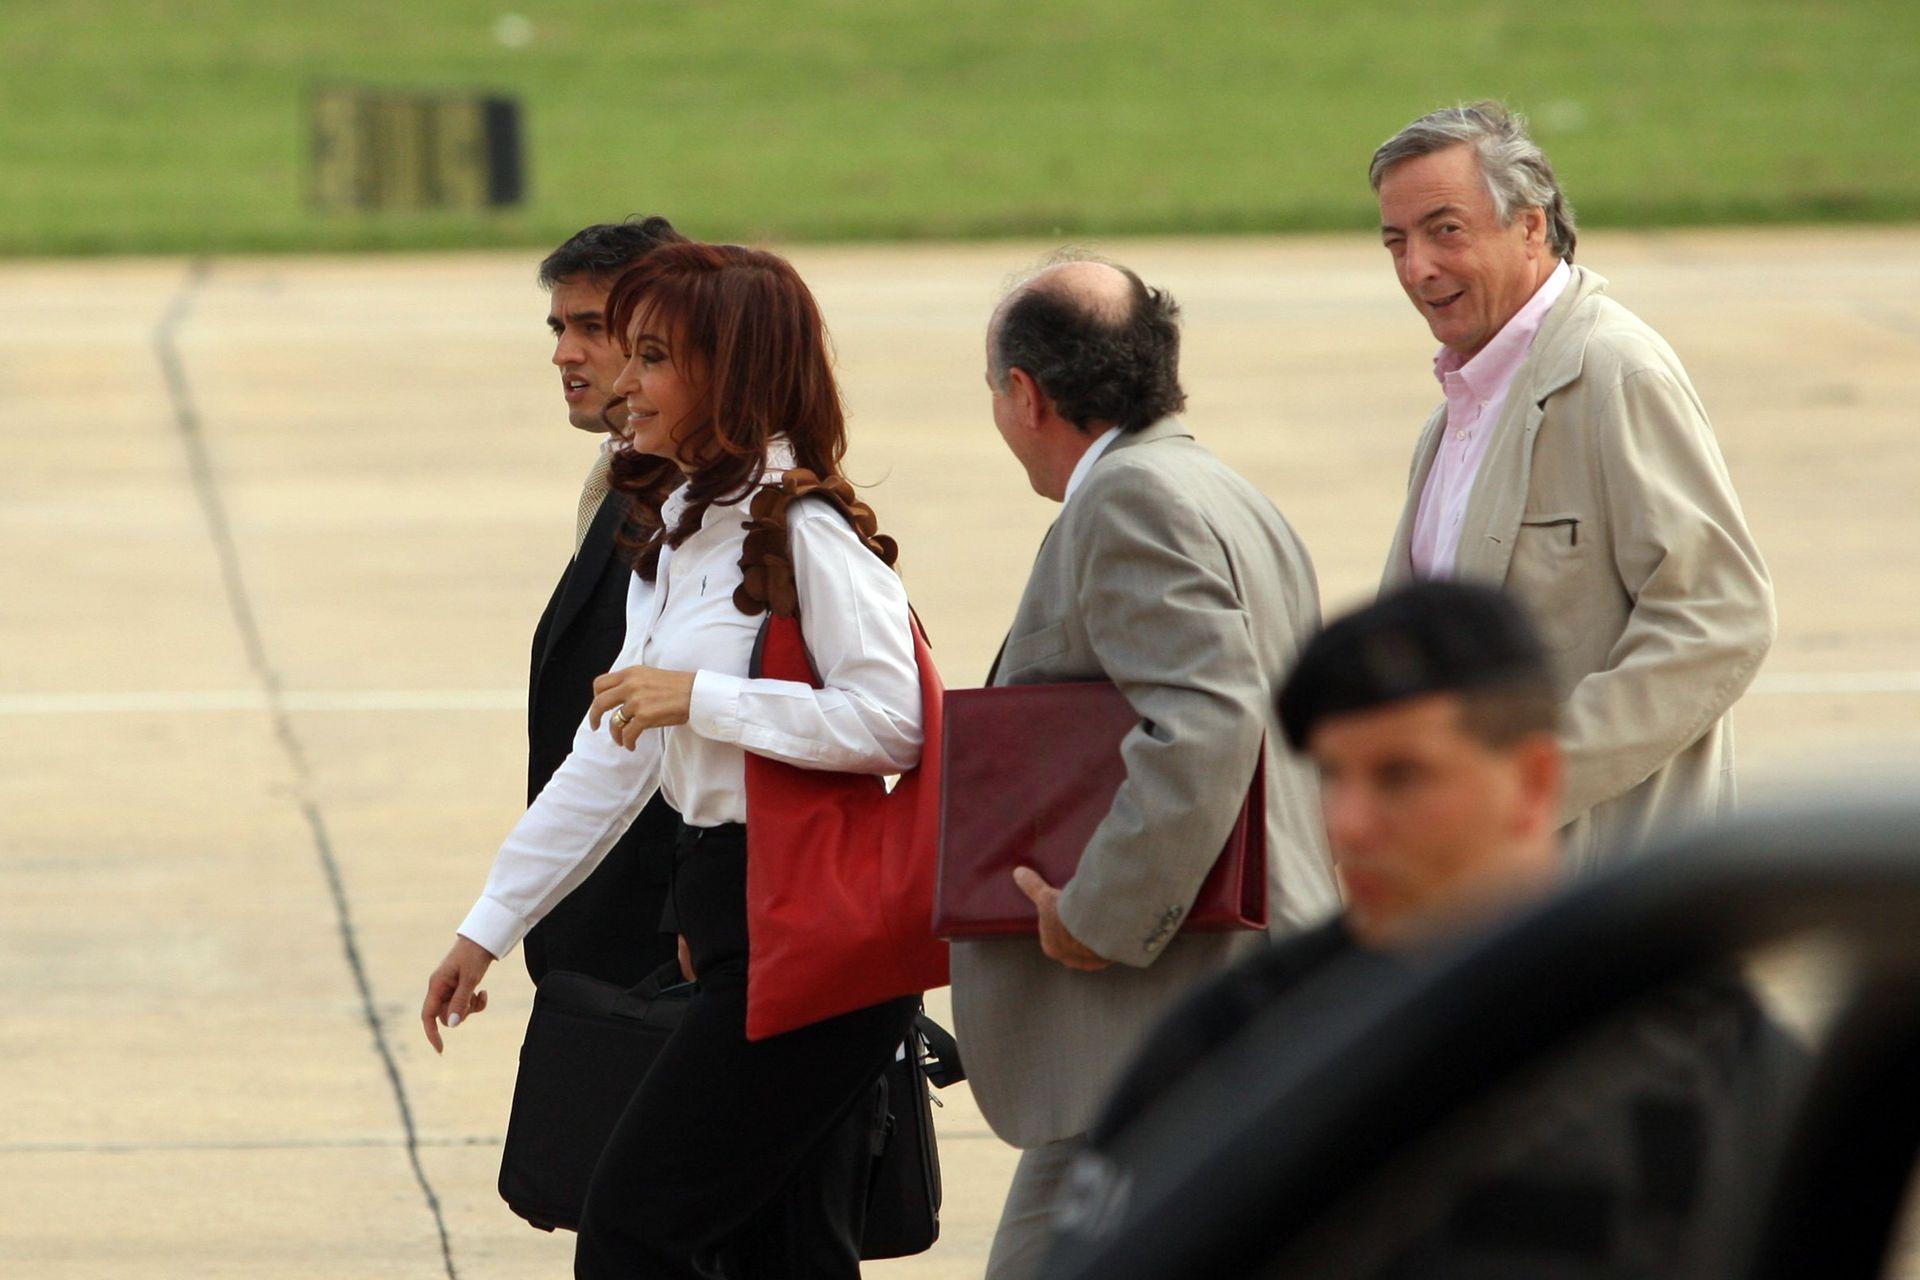 Llegada al Aeroparque Jorge Newbery de Cristina Fernandez de Kirchner junto a su esposo, procedentes del Calafate el 16 de marzo de 2009